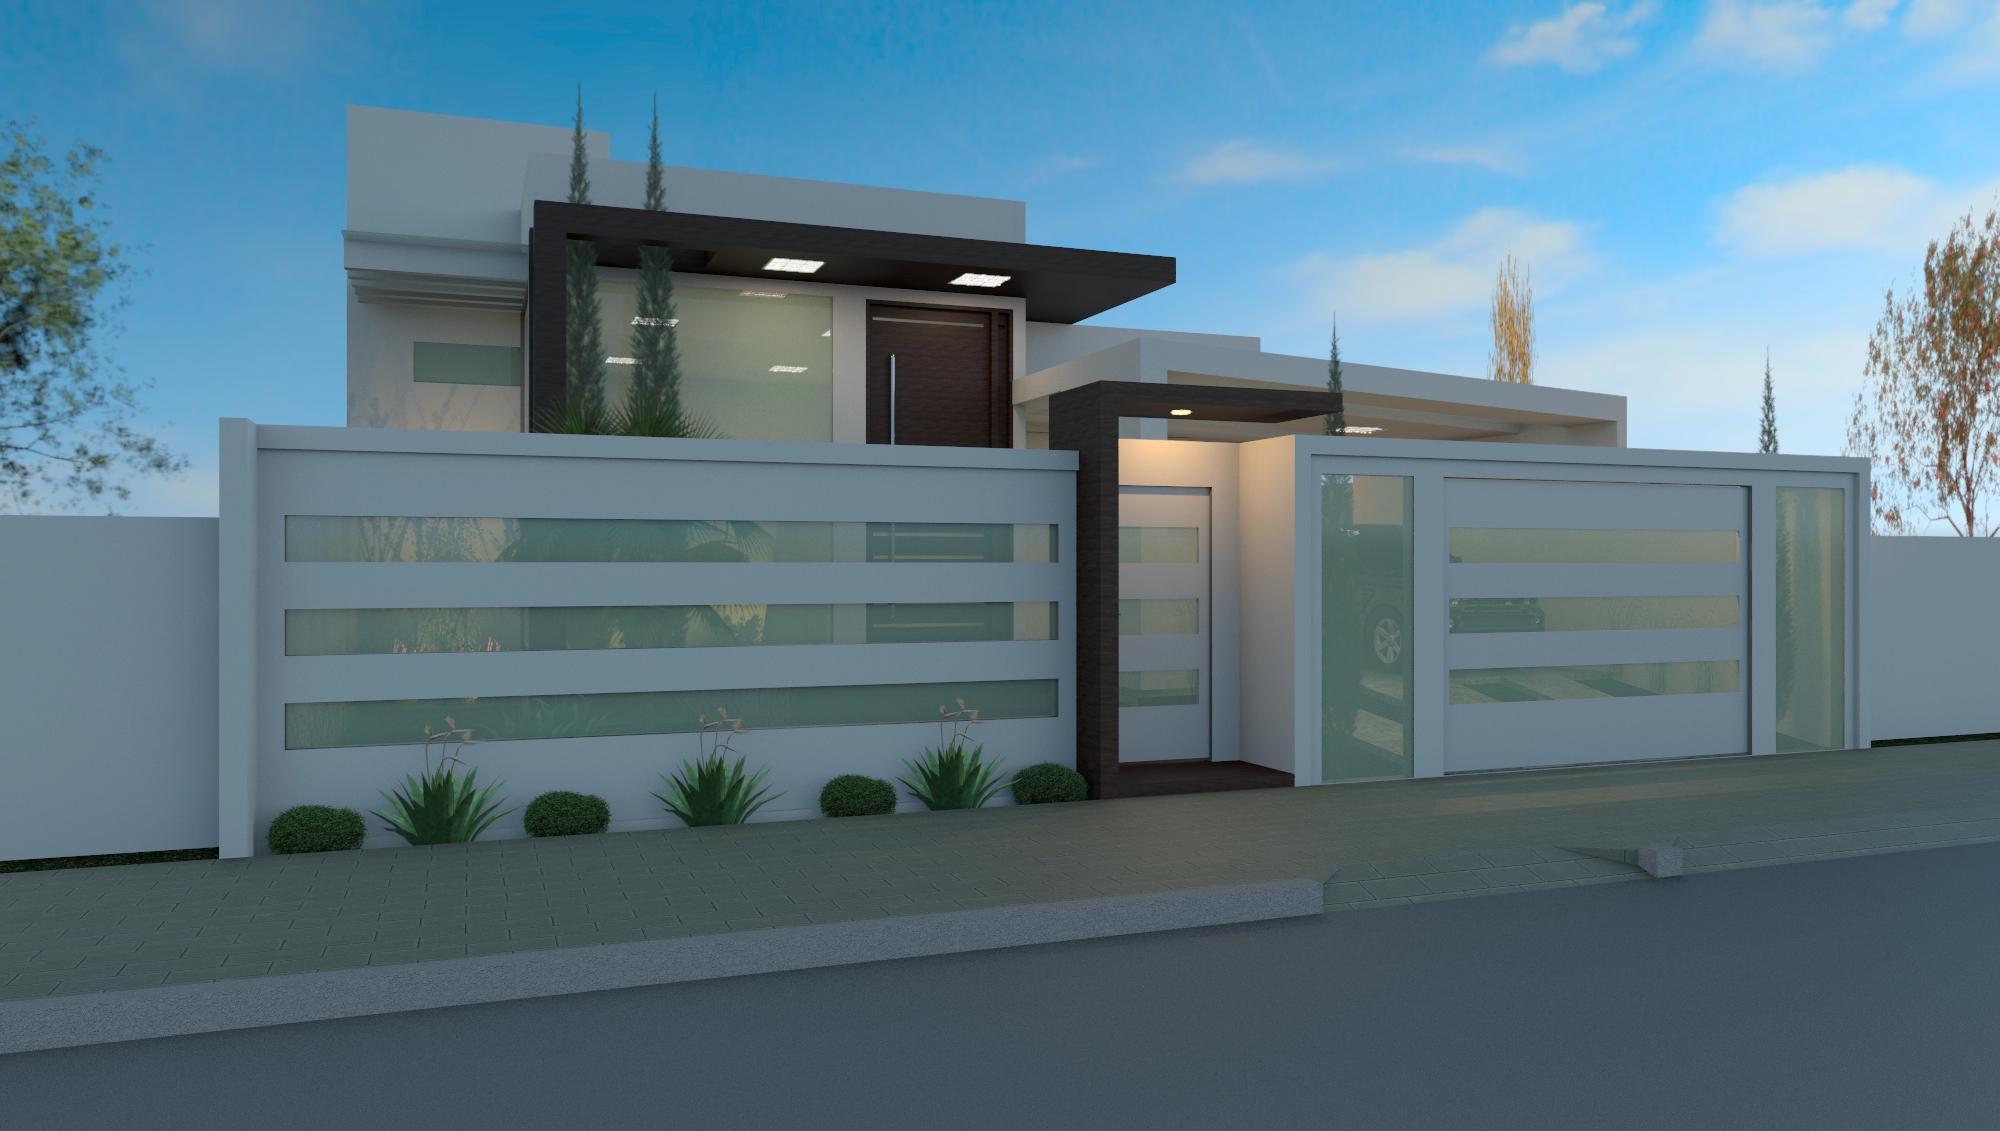 60 modelos de muros residenciais fachadas fotos e dicas for Aberturas para casas modernas